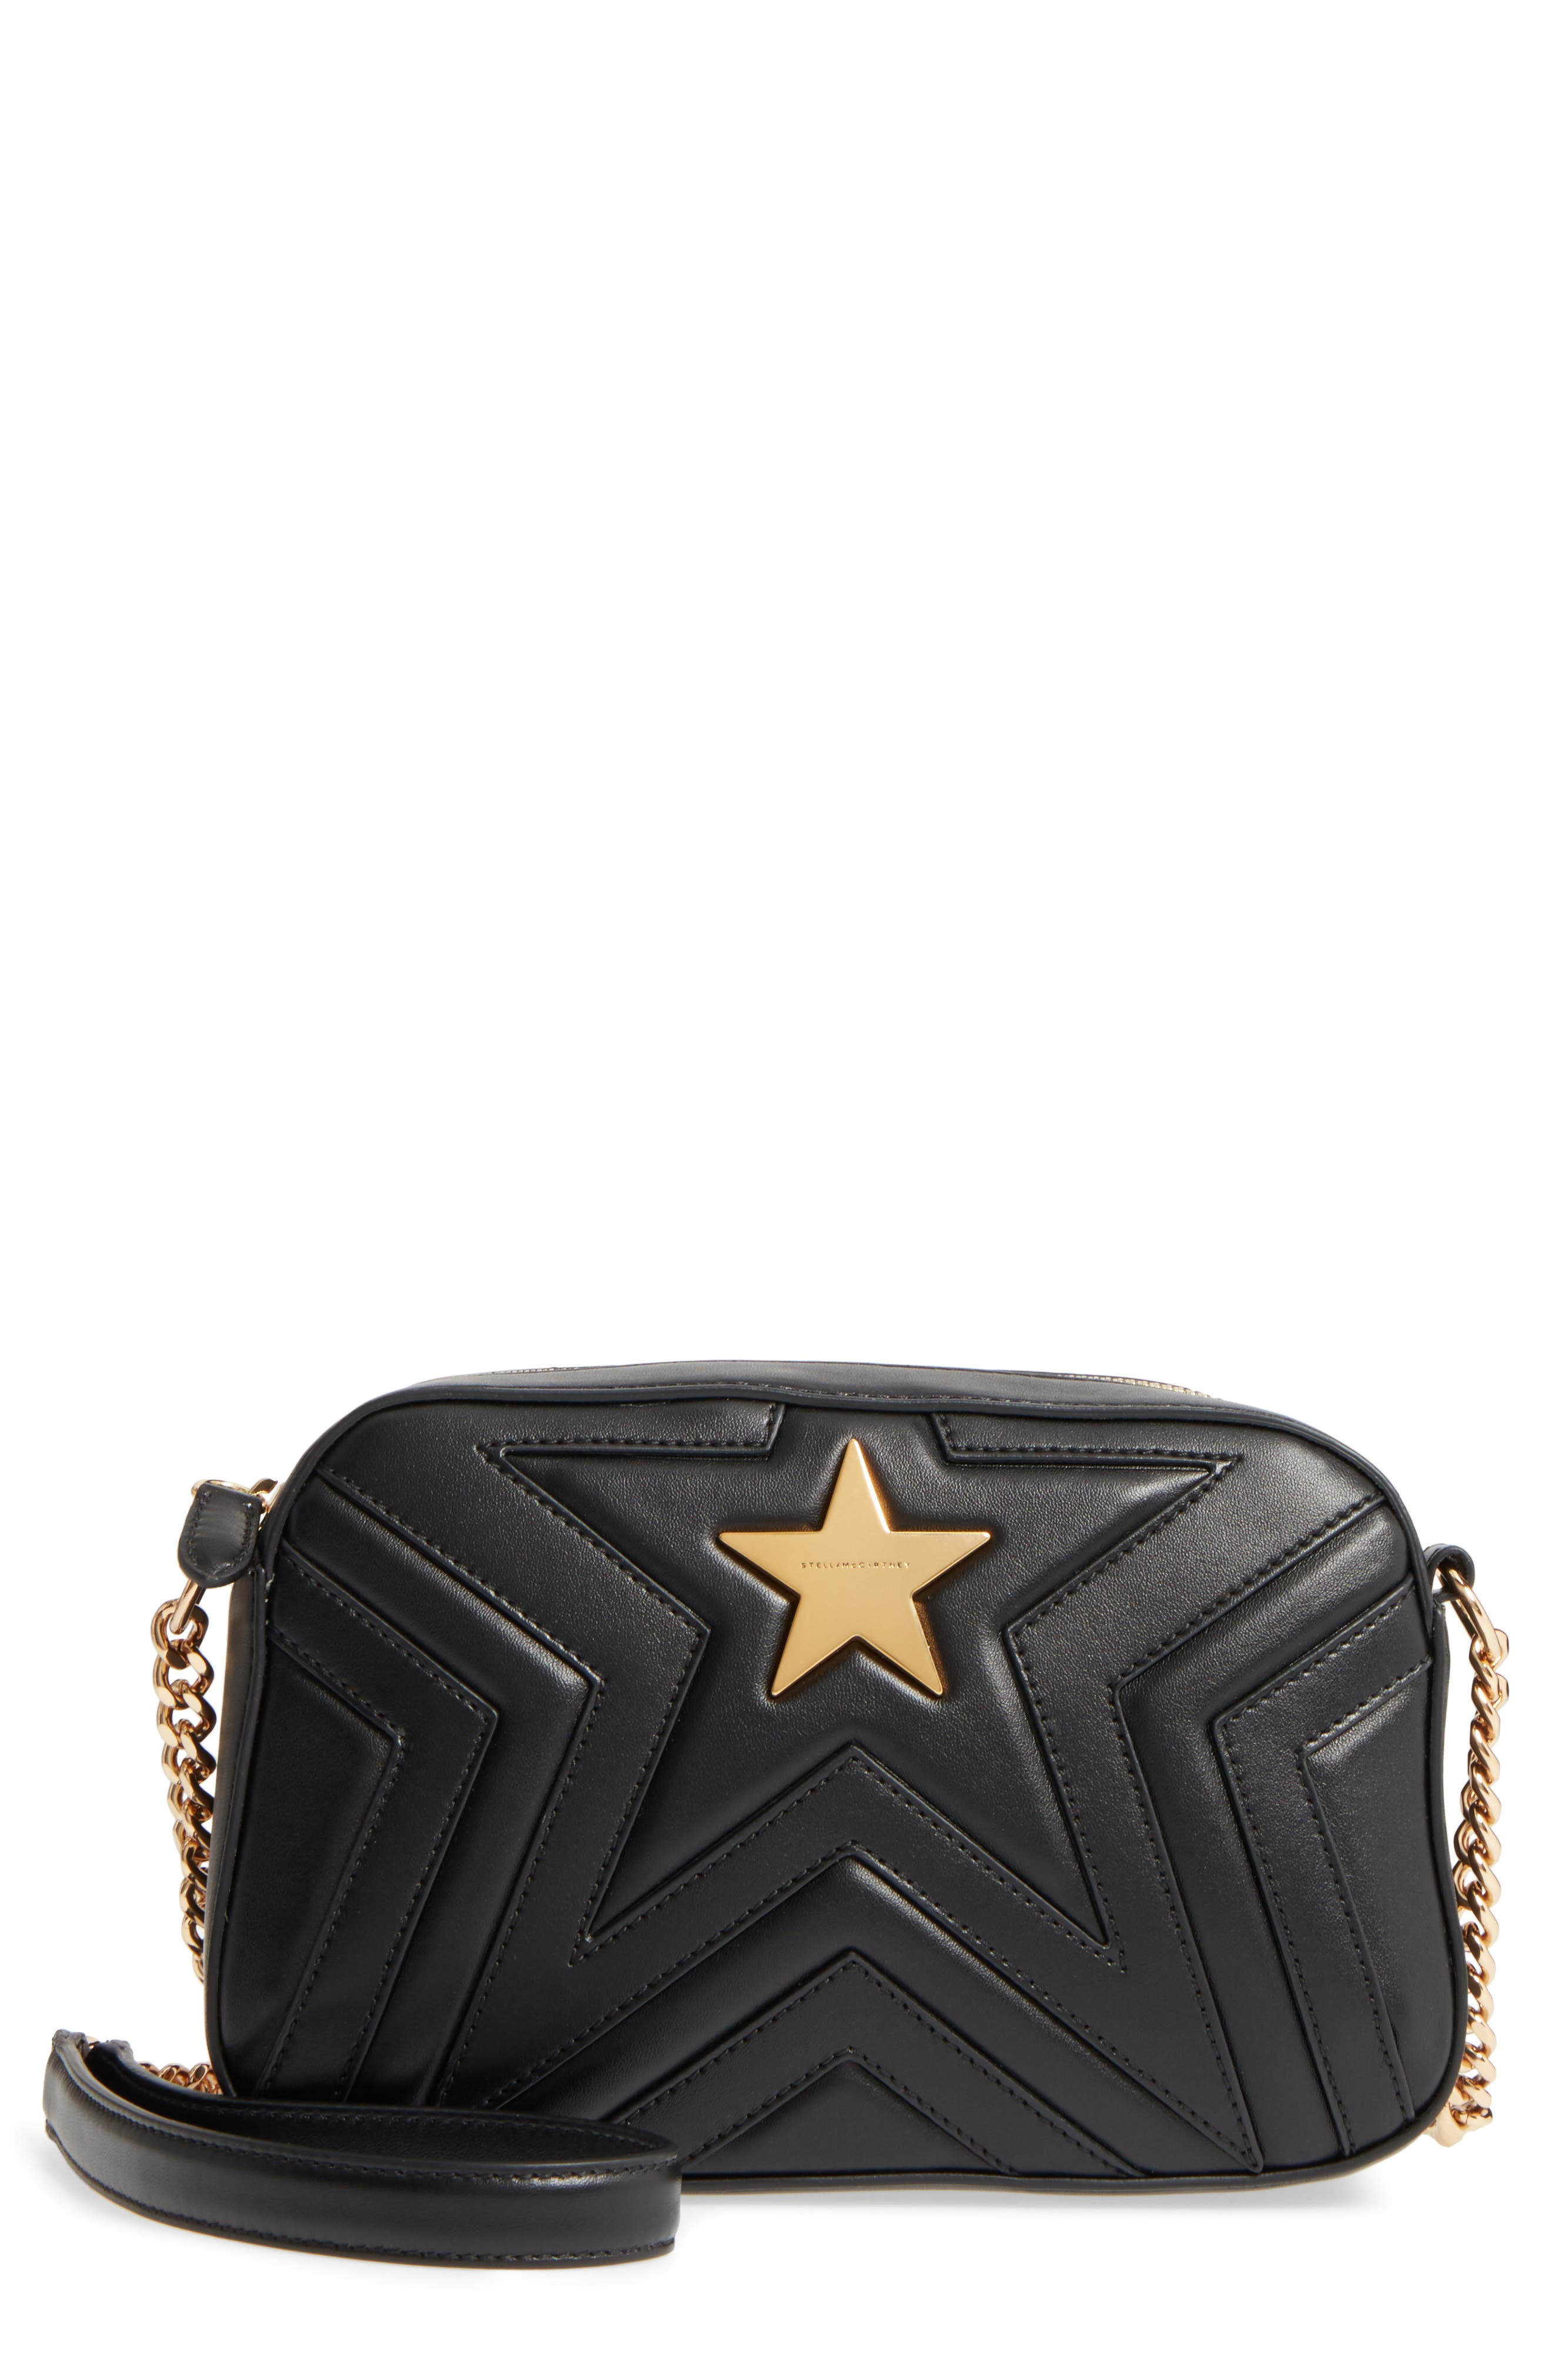 Stella McCartney Alter Nappa Faux Leather Shoulder Bag